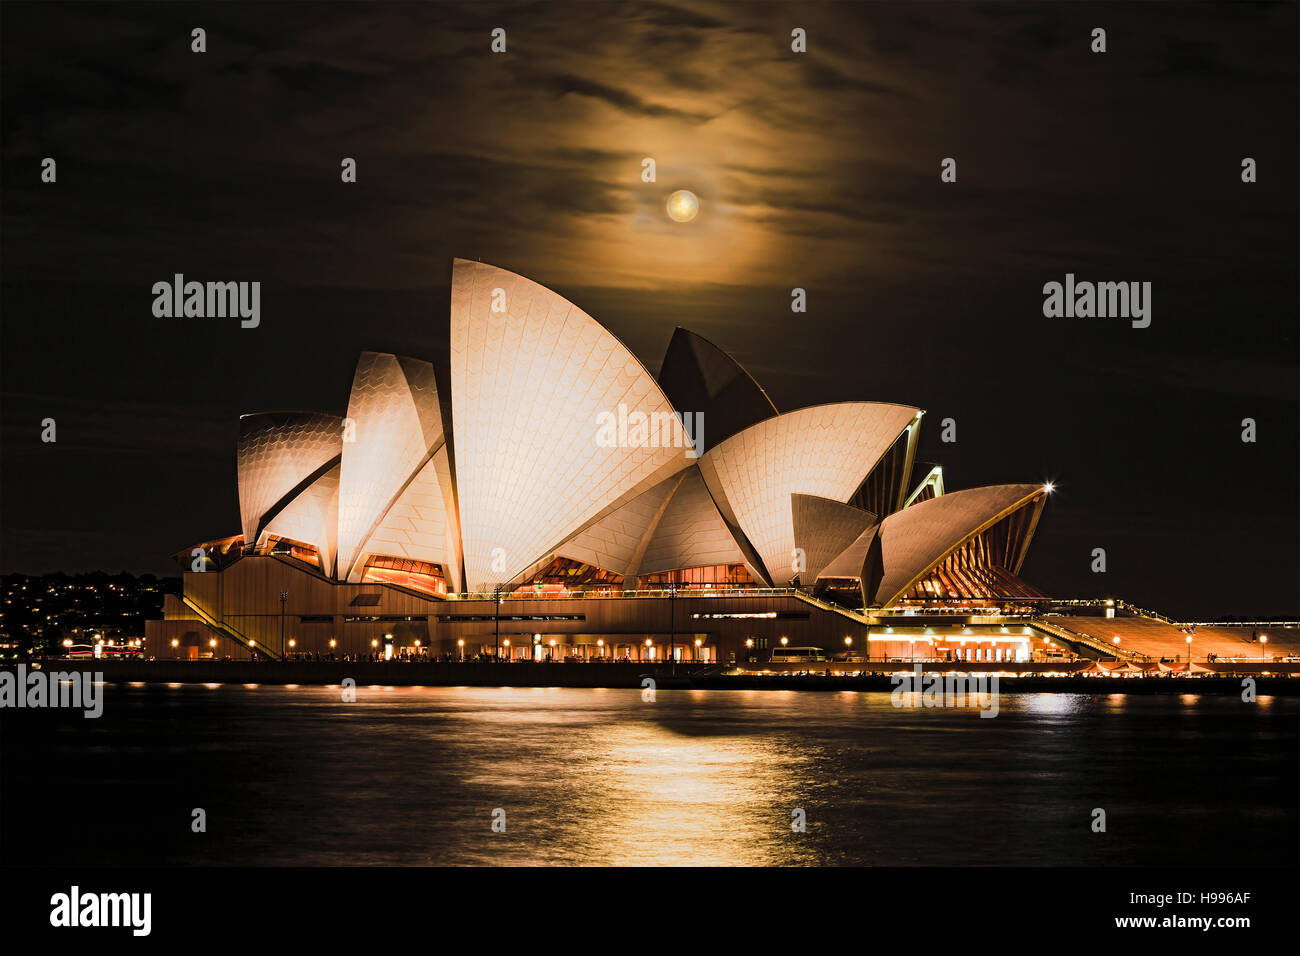 Sydney, Australia - 15 November 2016: Super full rusty moon rising over Sydney Opera House in Australia during unique - Stock Image